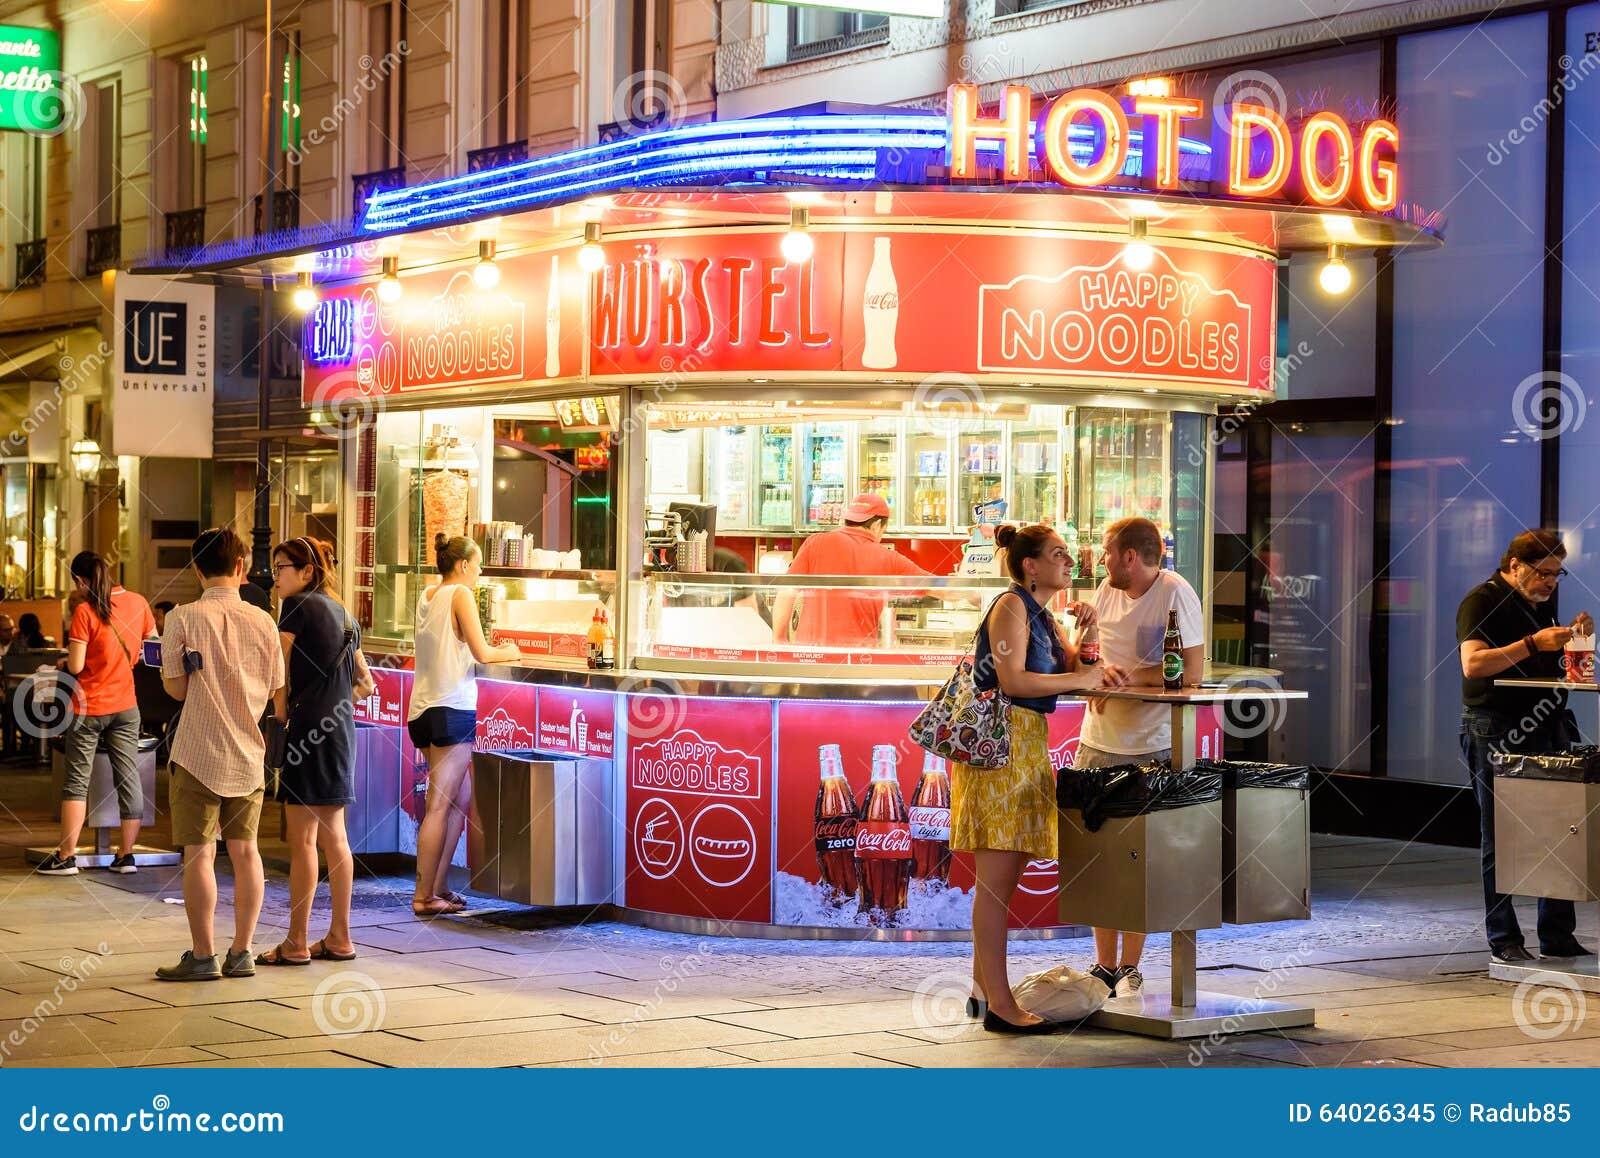 Buying A Hot Dog Cart Business